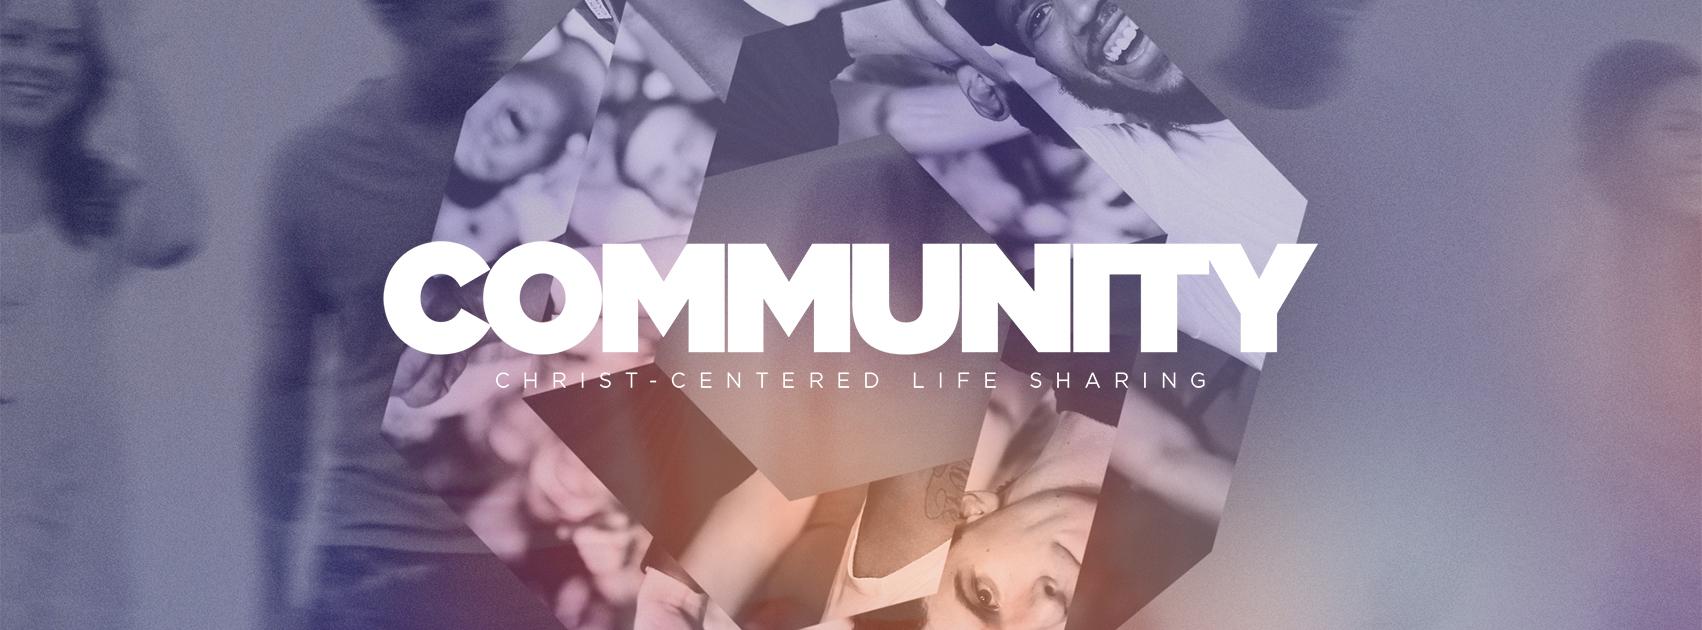 Community FB Cover Photo.jpg